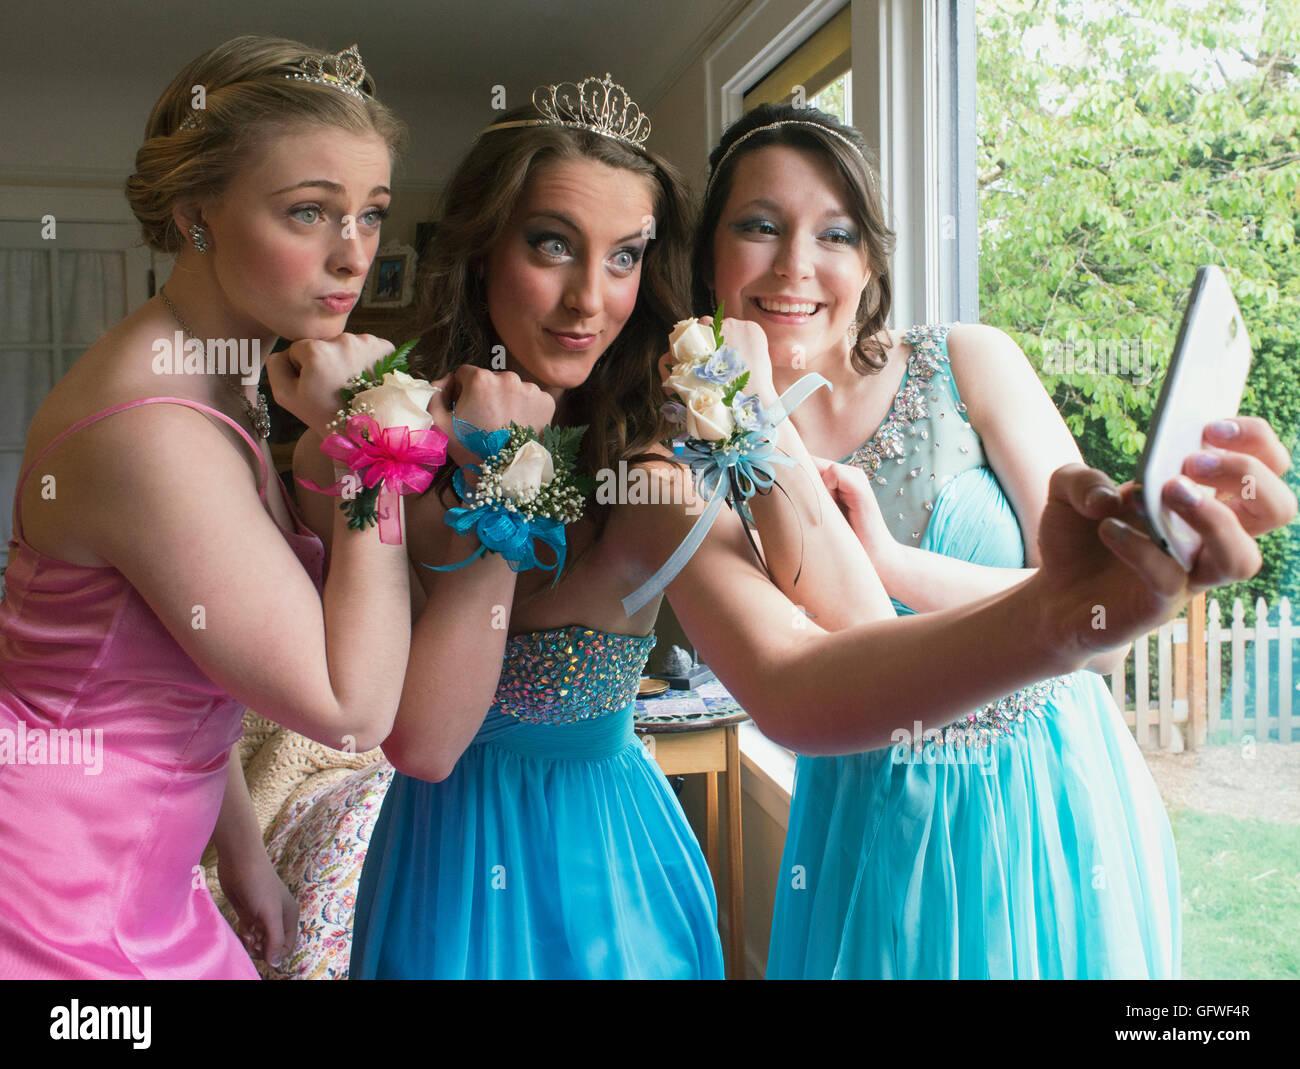 Three girls taking prom selfies. - Stock Image